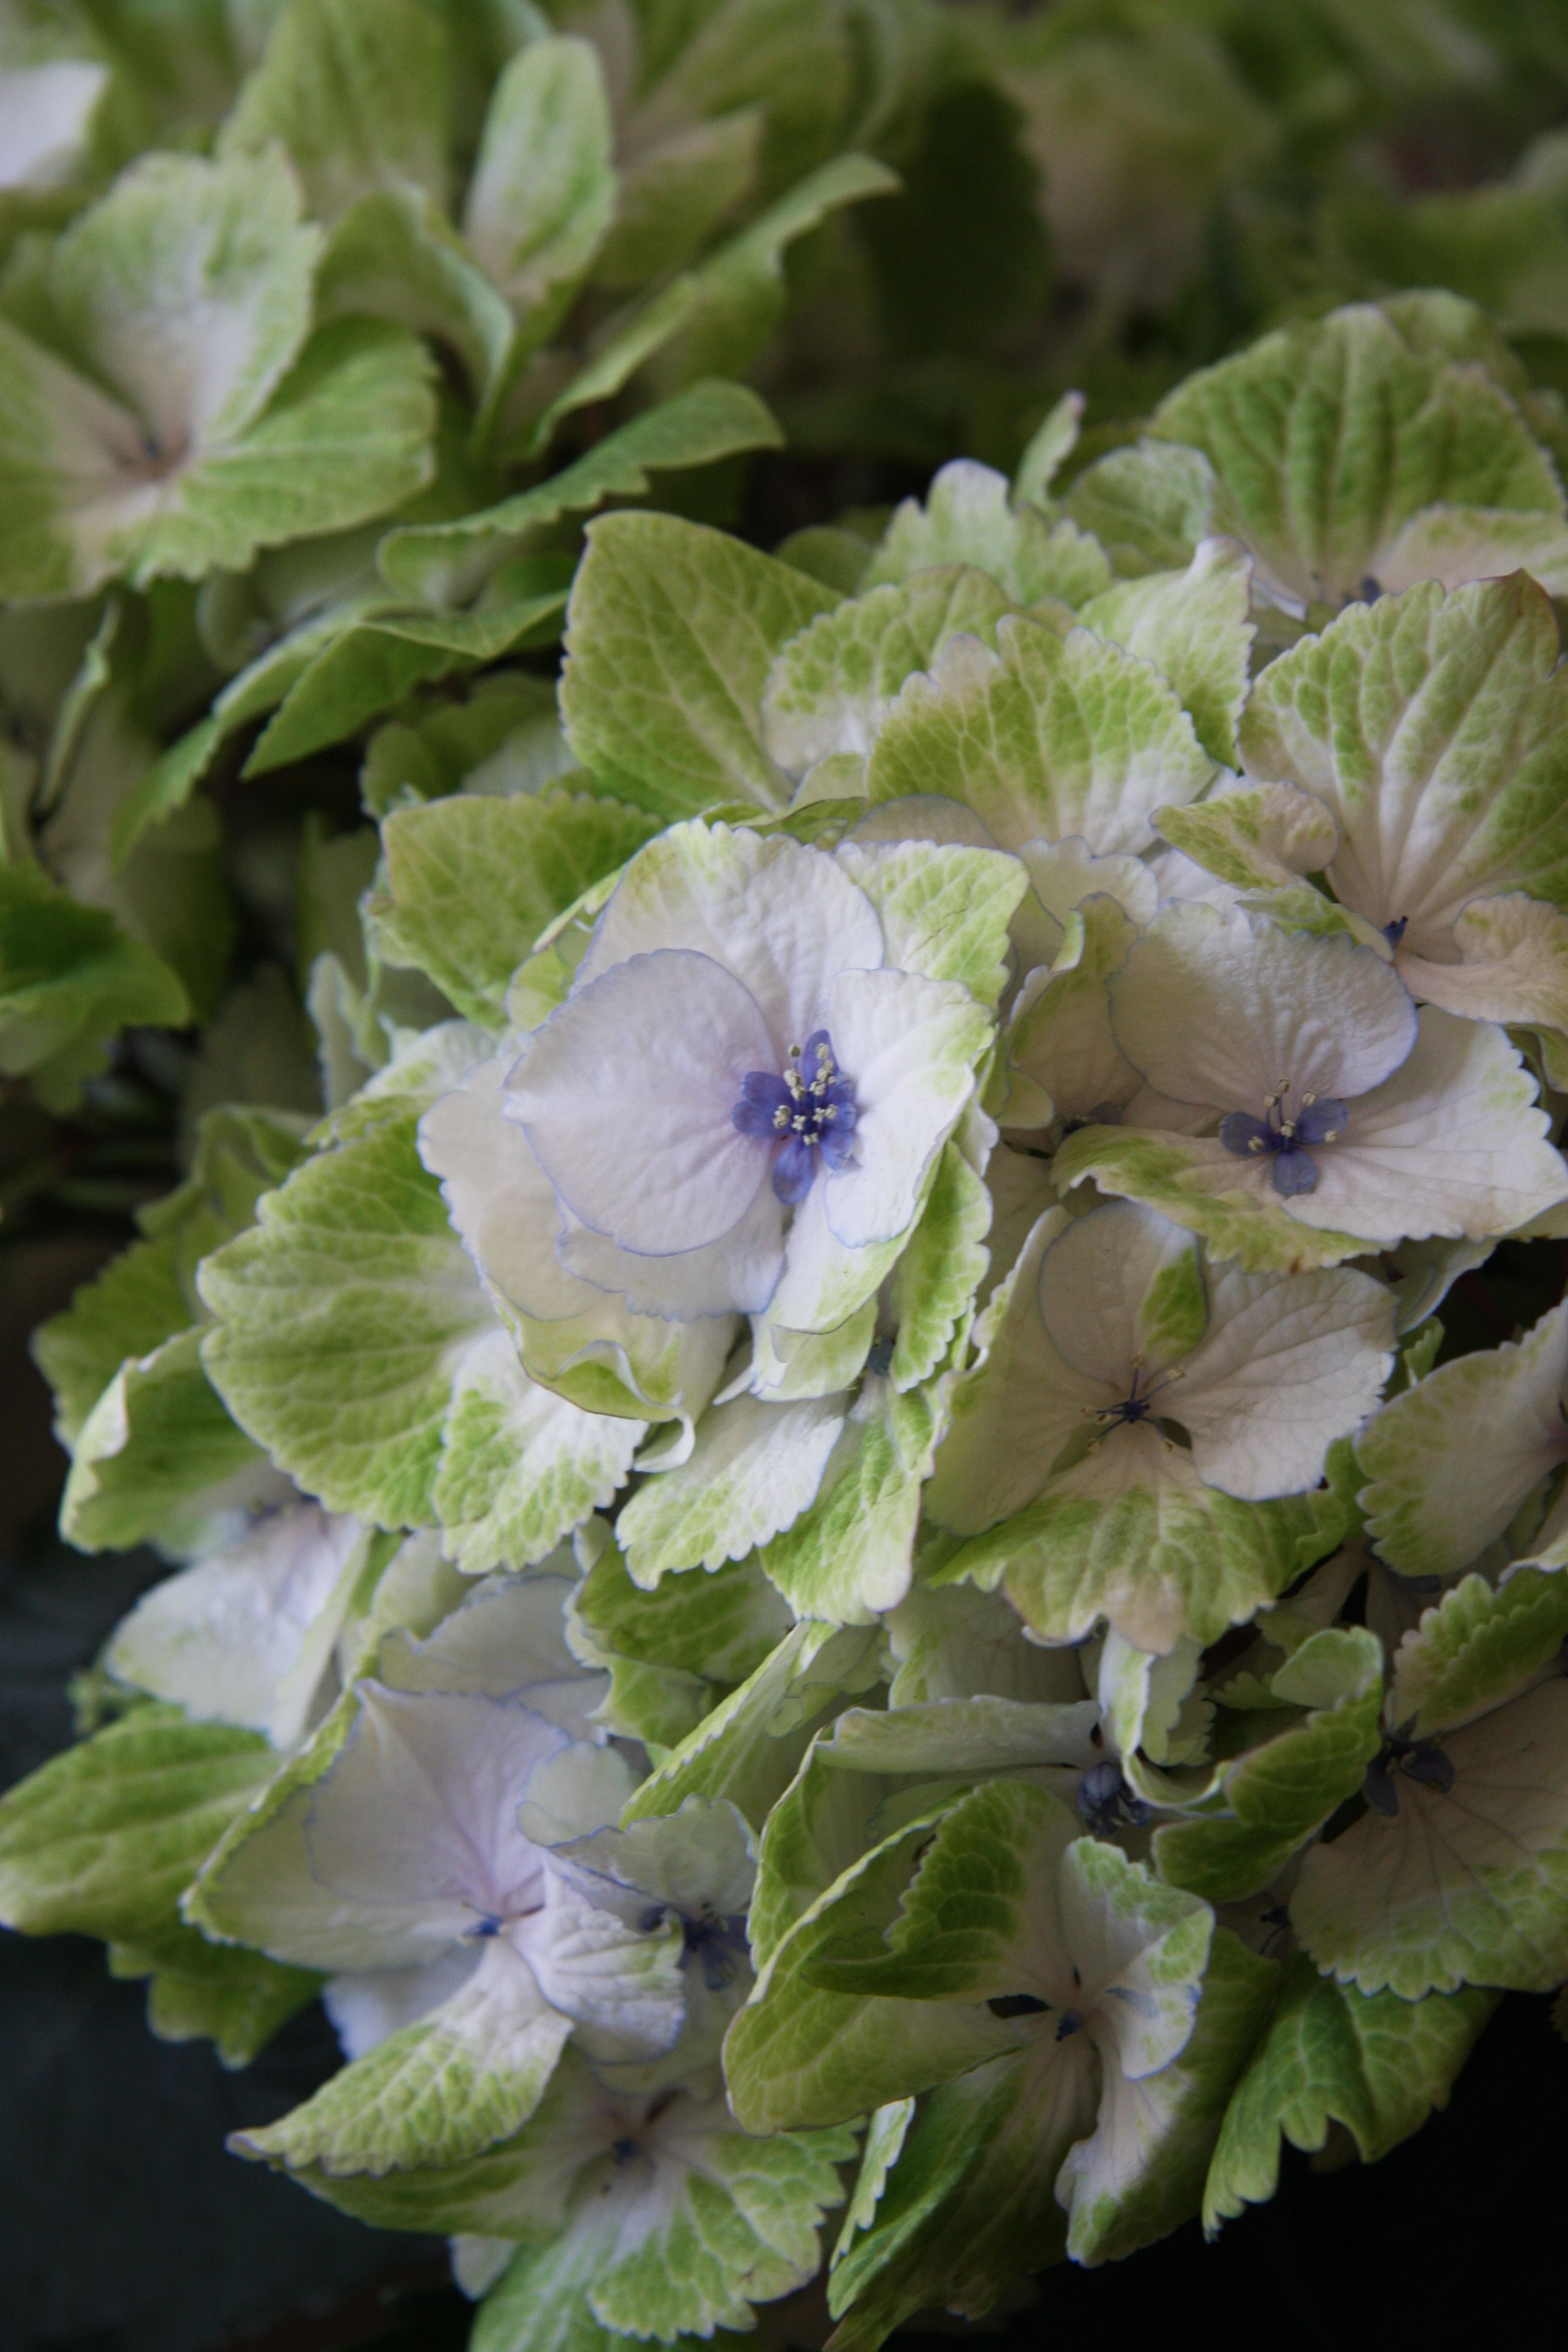 French Hydrangea 'Magical Noblesse' (Hydrangea macrophylla